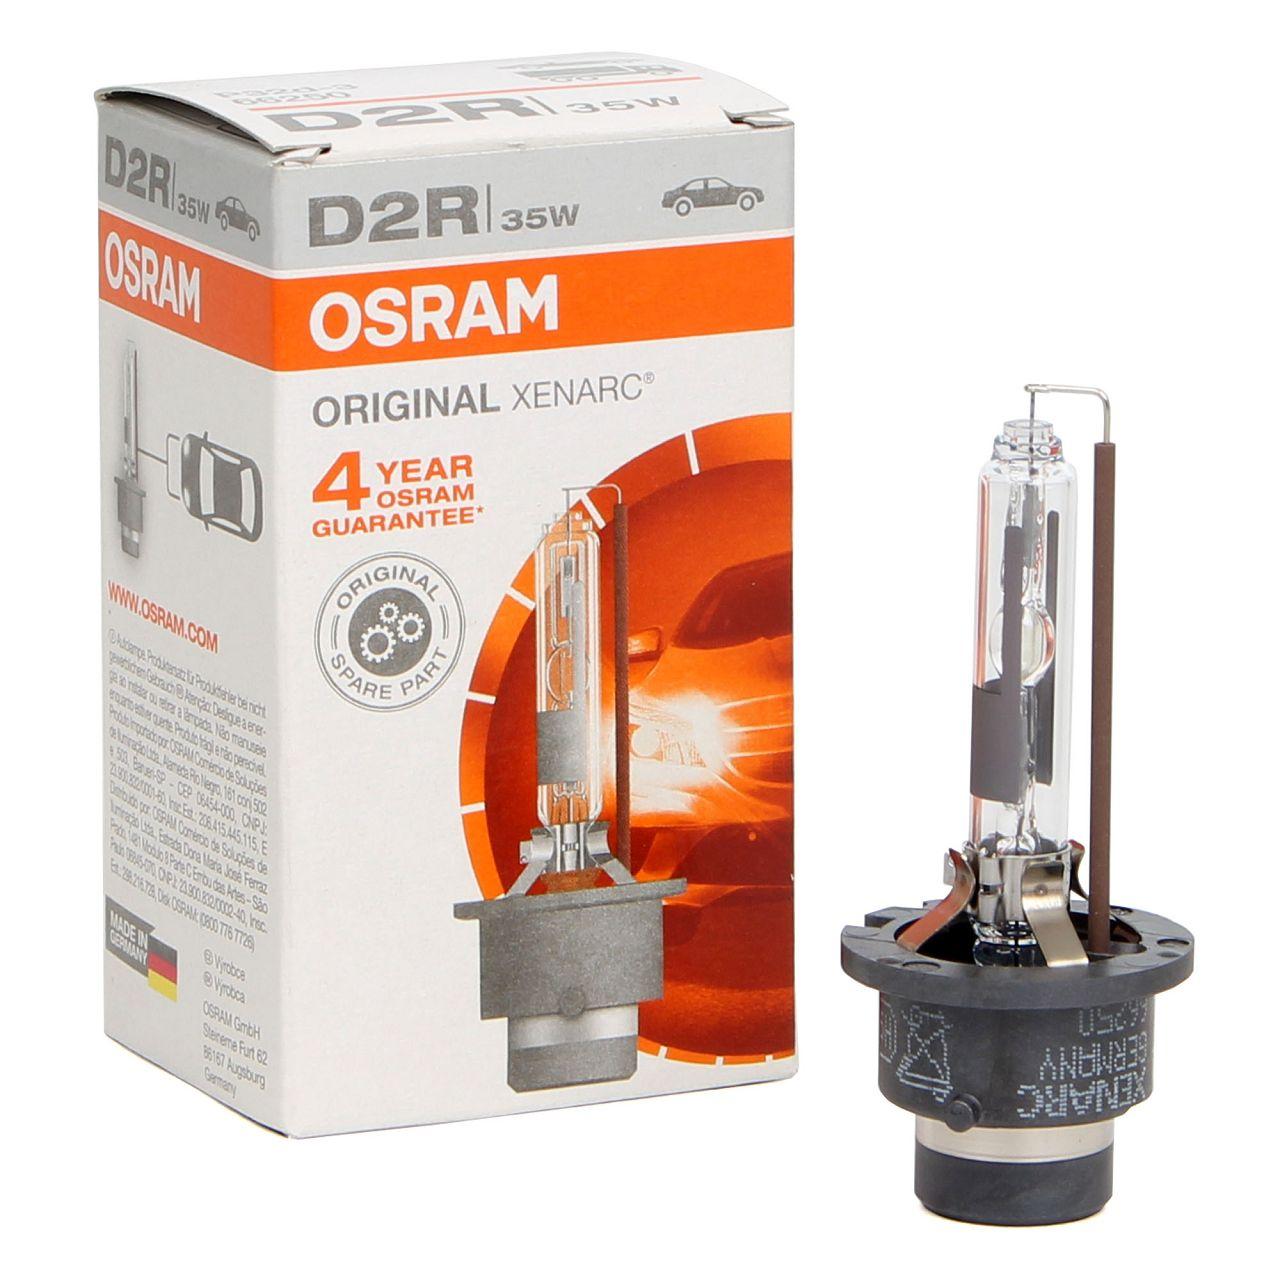 OSRAM Xenarc Xenon Brenner D2R ORIGINAL 85V 35W P32d-3 66250